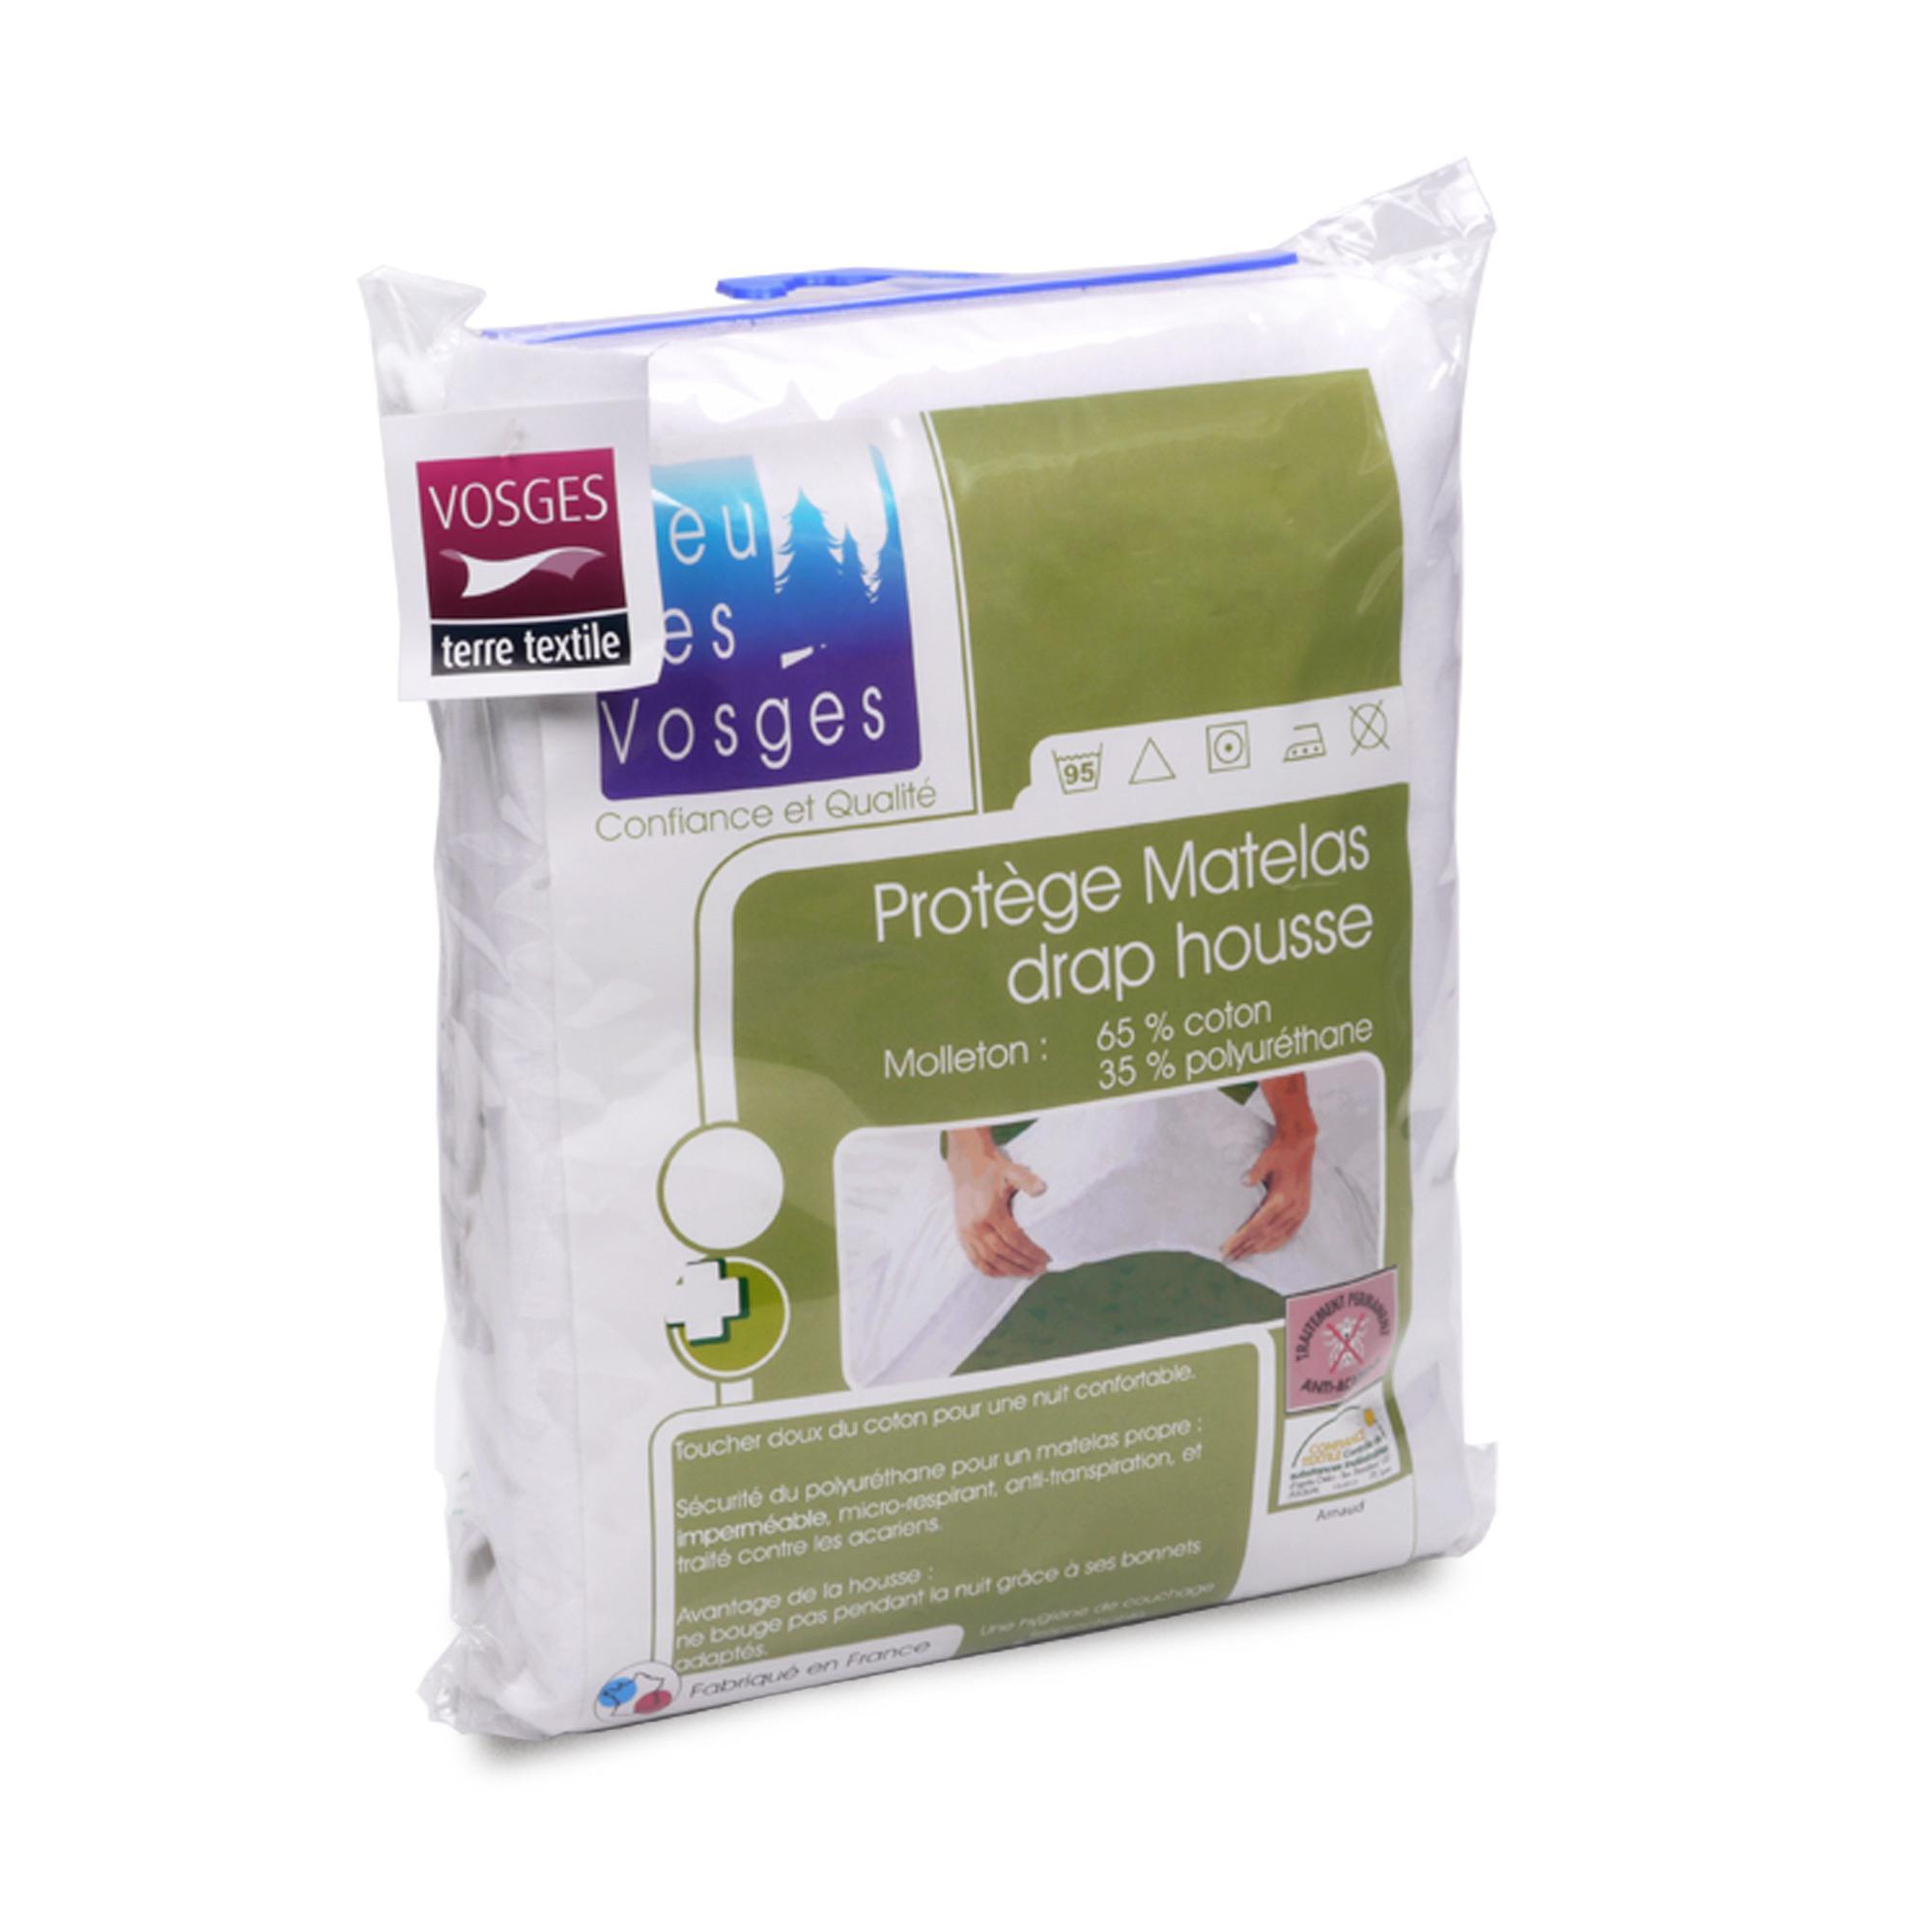 prot ge matelas imperm able 140x190 cm arnaud molleton contrecoll polyur thane micro. Black Bedroom Furniture Sets. Home Design Ideas